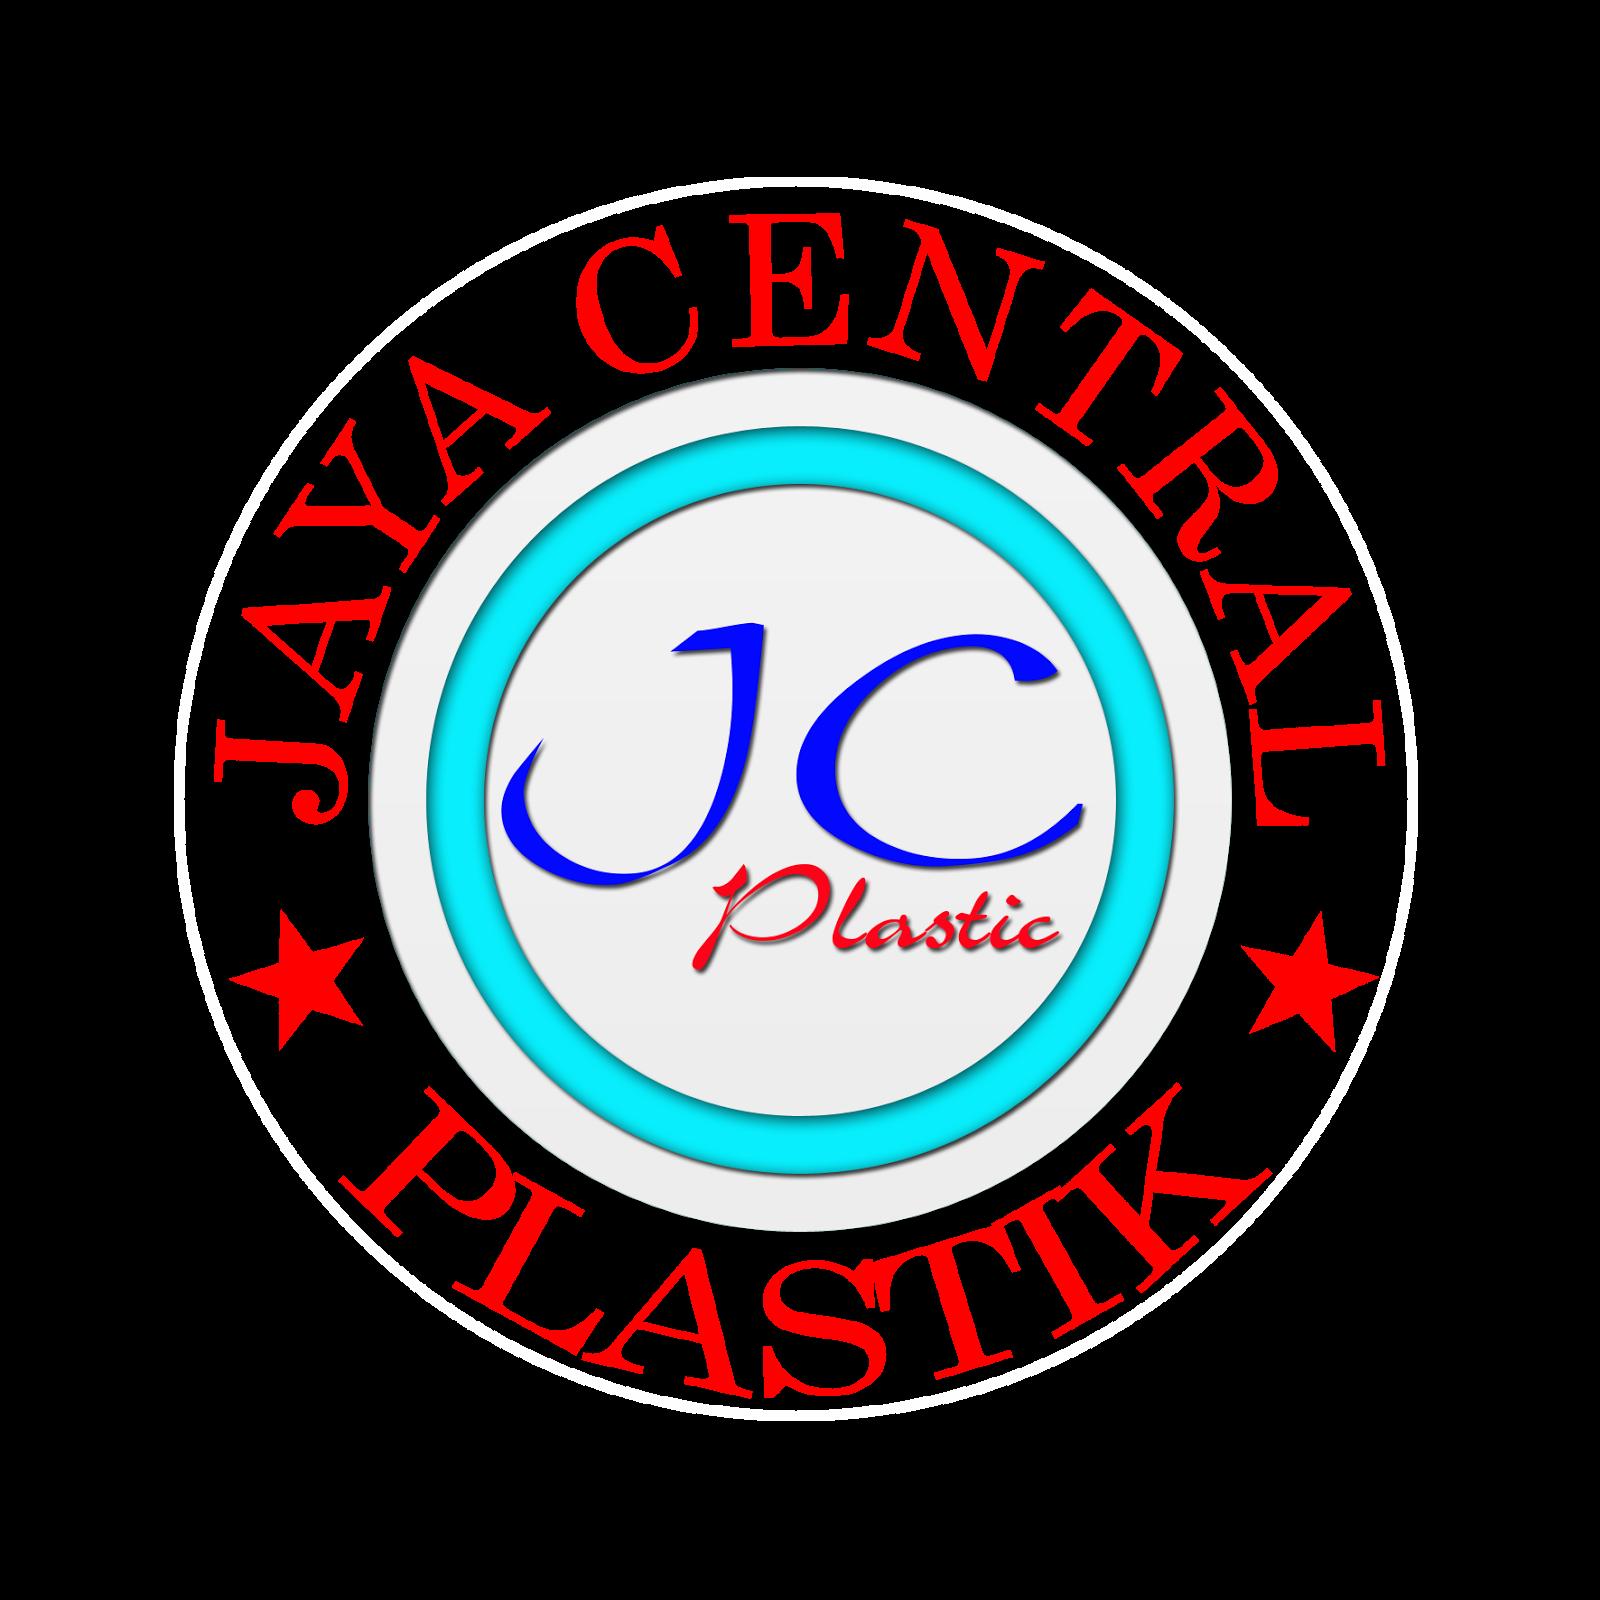 Jaya Central Plastik September 2020